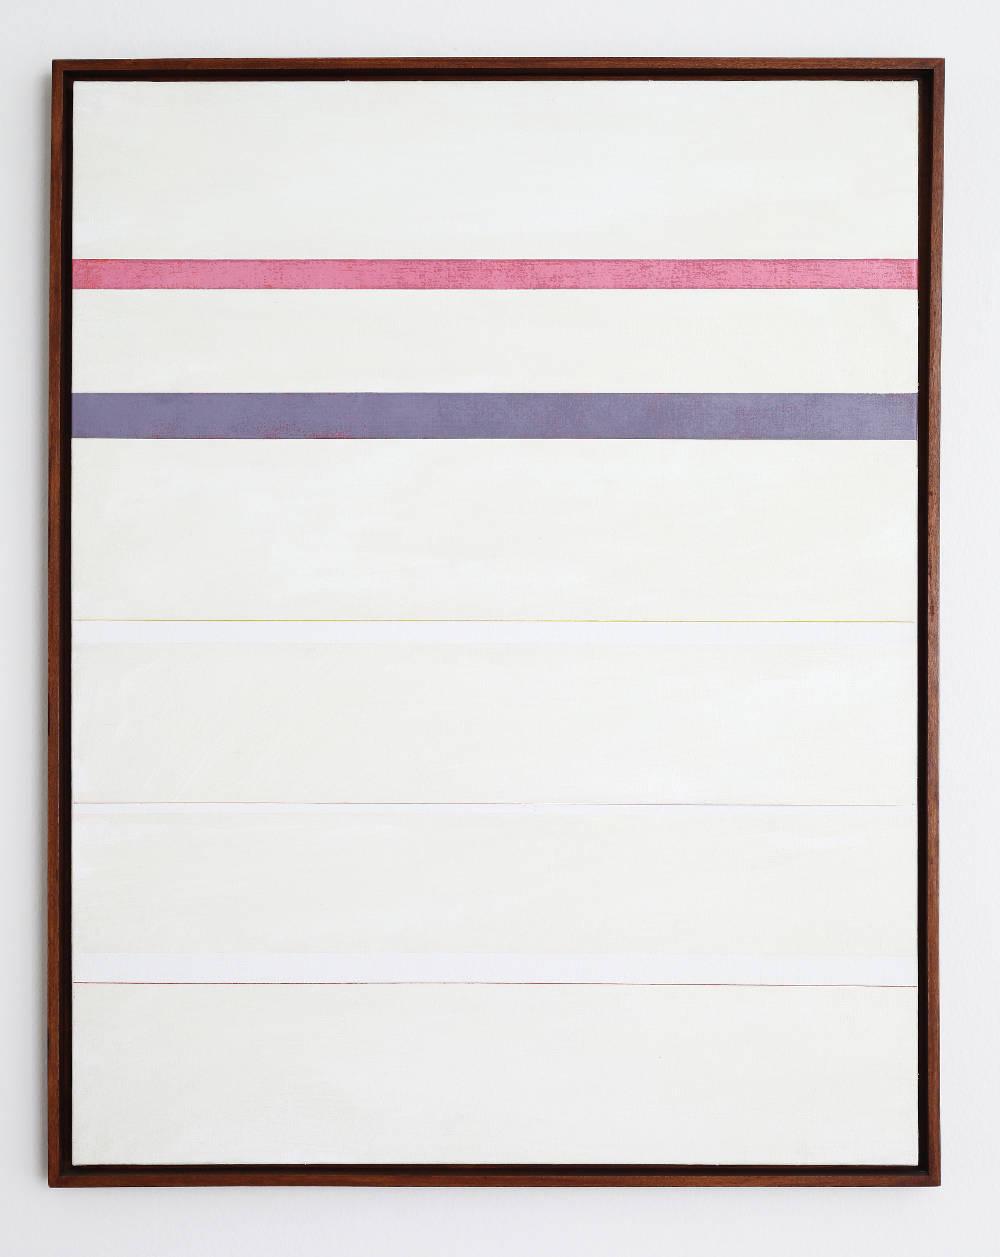 Claudio Verna, Pittura, 1976. Acrylic and oil on canvas 90 x 70 cm 35.4 x 27.5 inch.